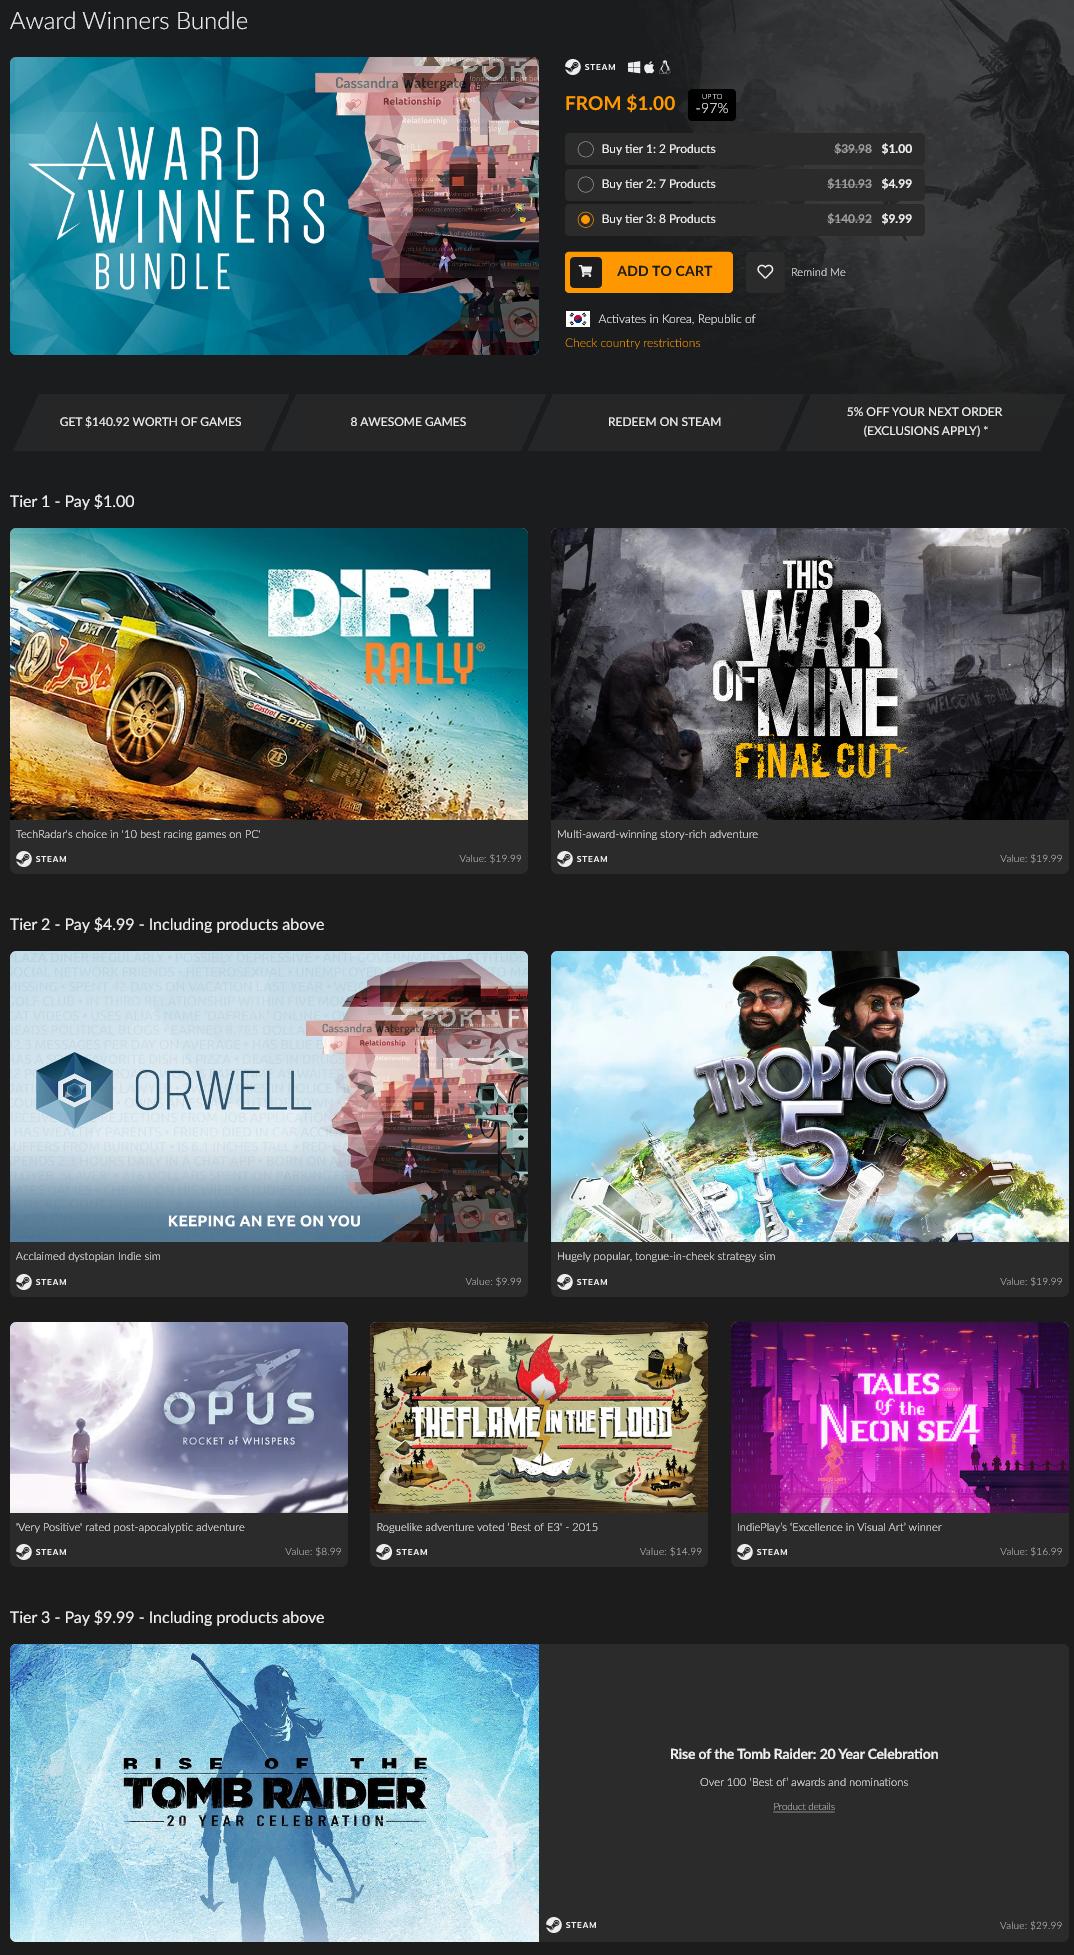 Screenshot 2021-06-15 at 00-16-49 Award Winners Bundle Steam Game Bundle Fanatical.png